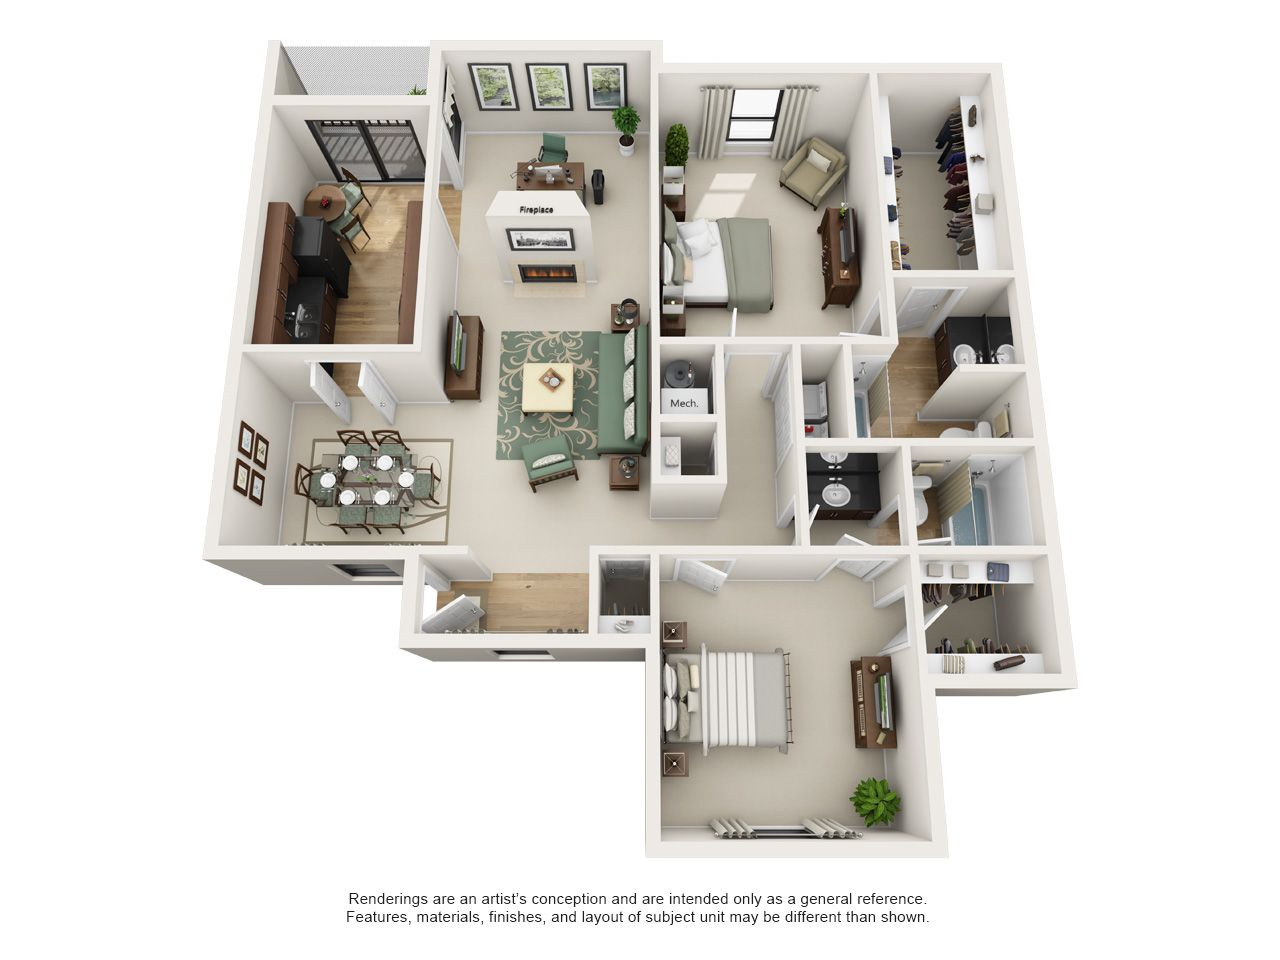 One And Two Bedroom Apartment Floor Plans Rosemont At East Cobb Marietta Georgia Apartmen Apartment Floor Plans Two Bedroom Apartments Apartment Layout